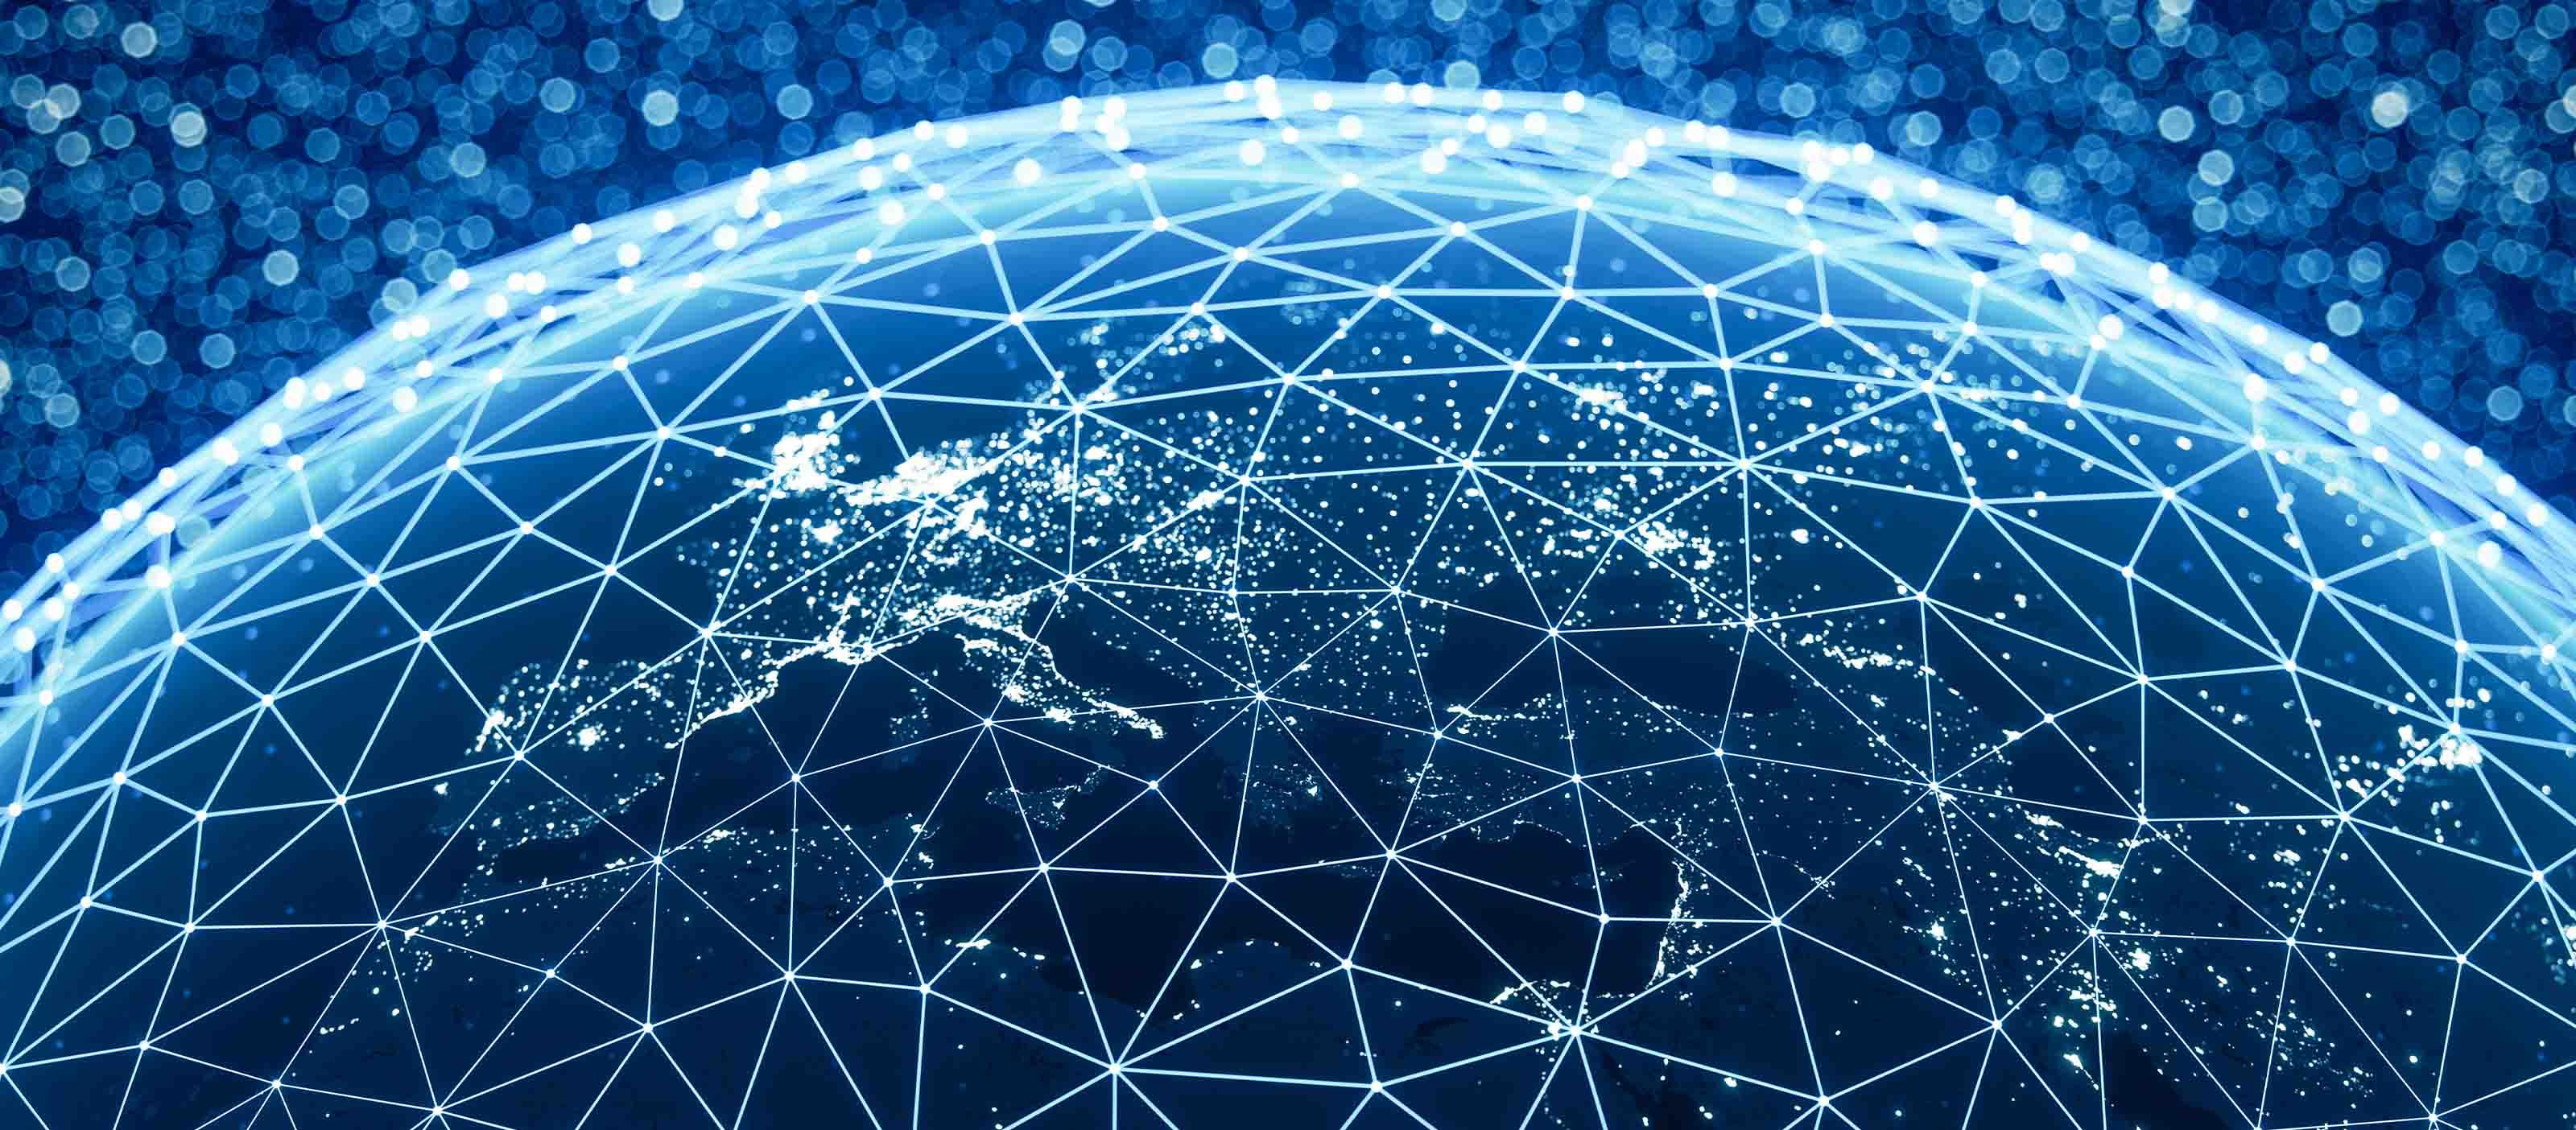 Software for industrial networks   GE Digital